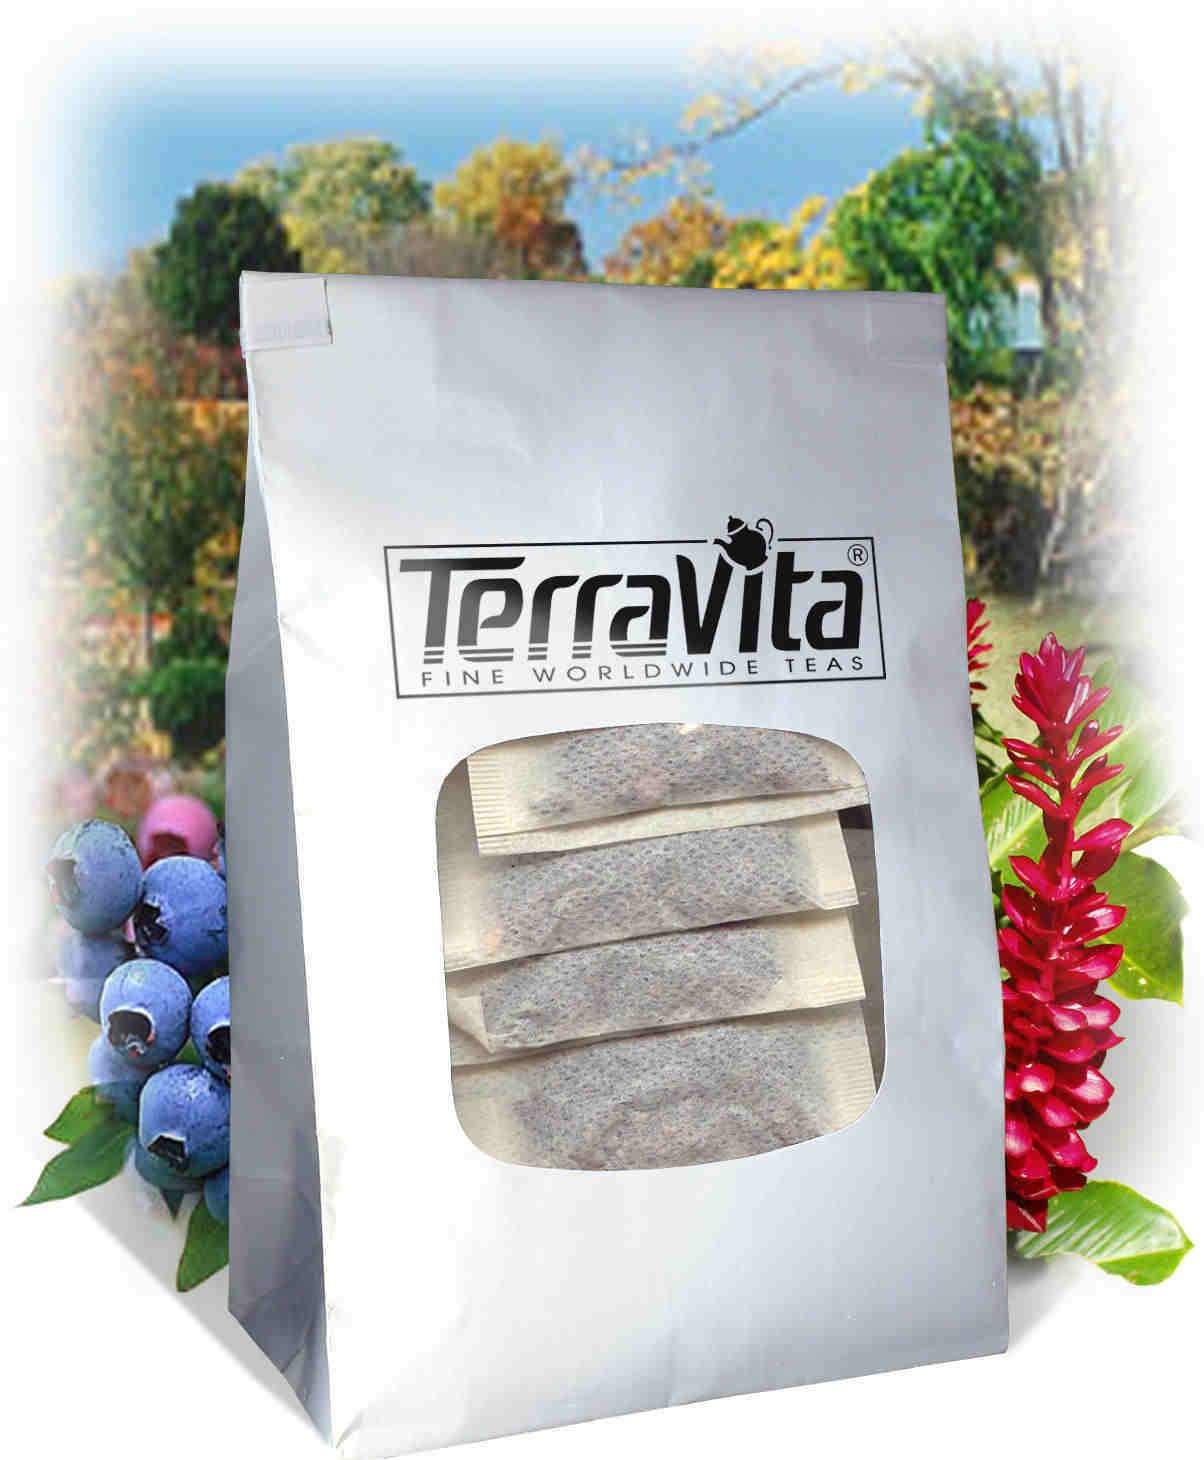 Chaparral Leaf Tea